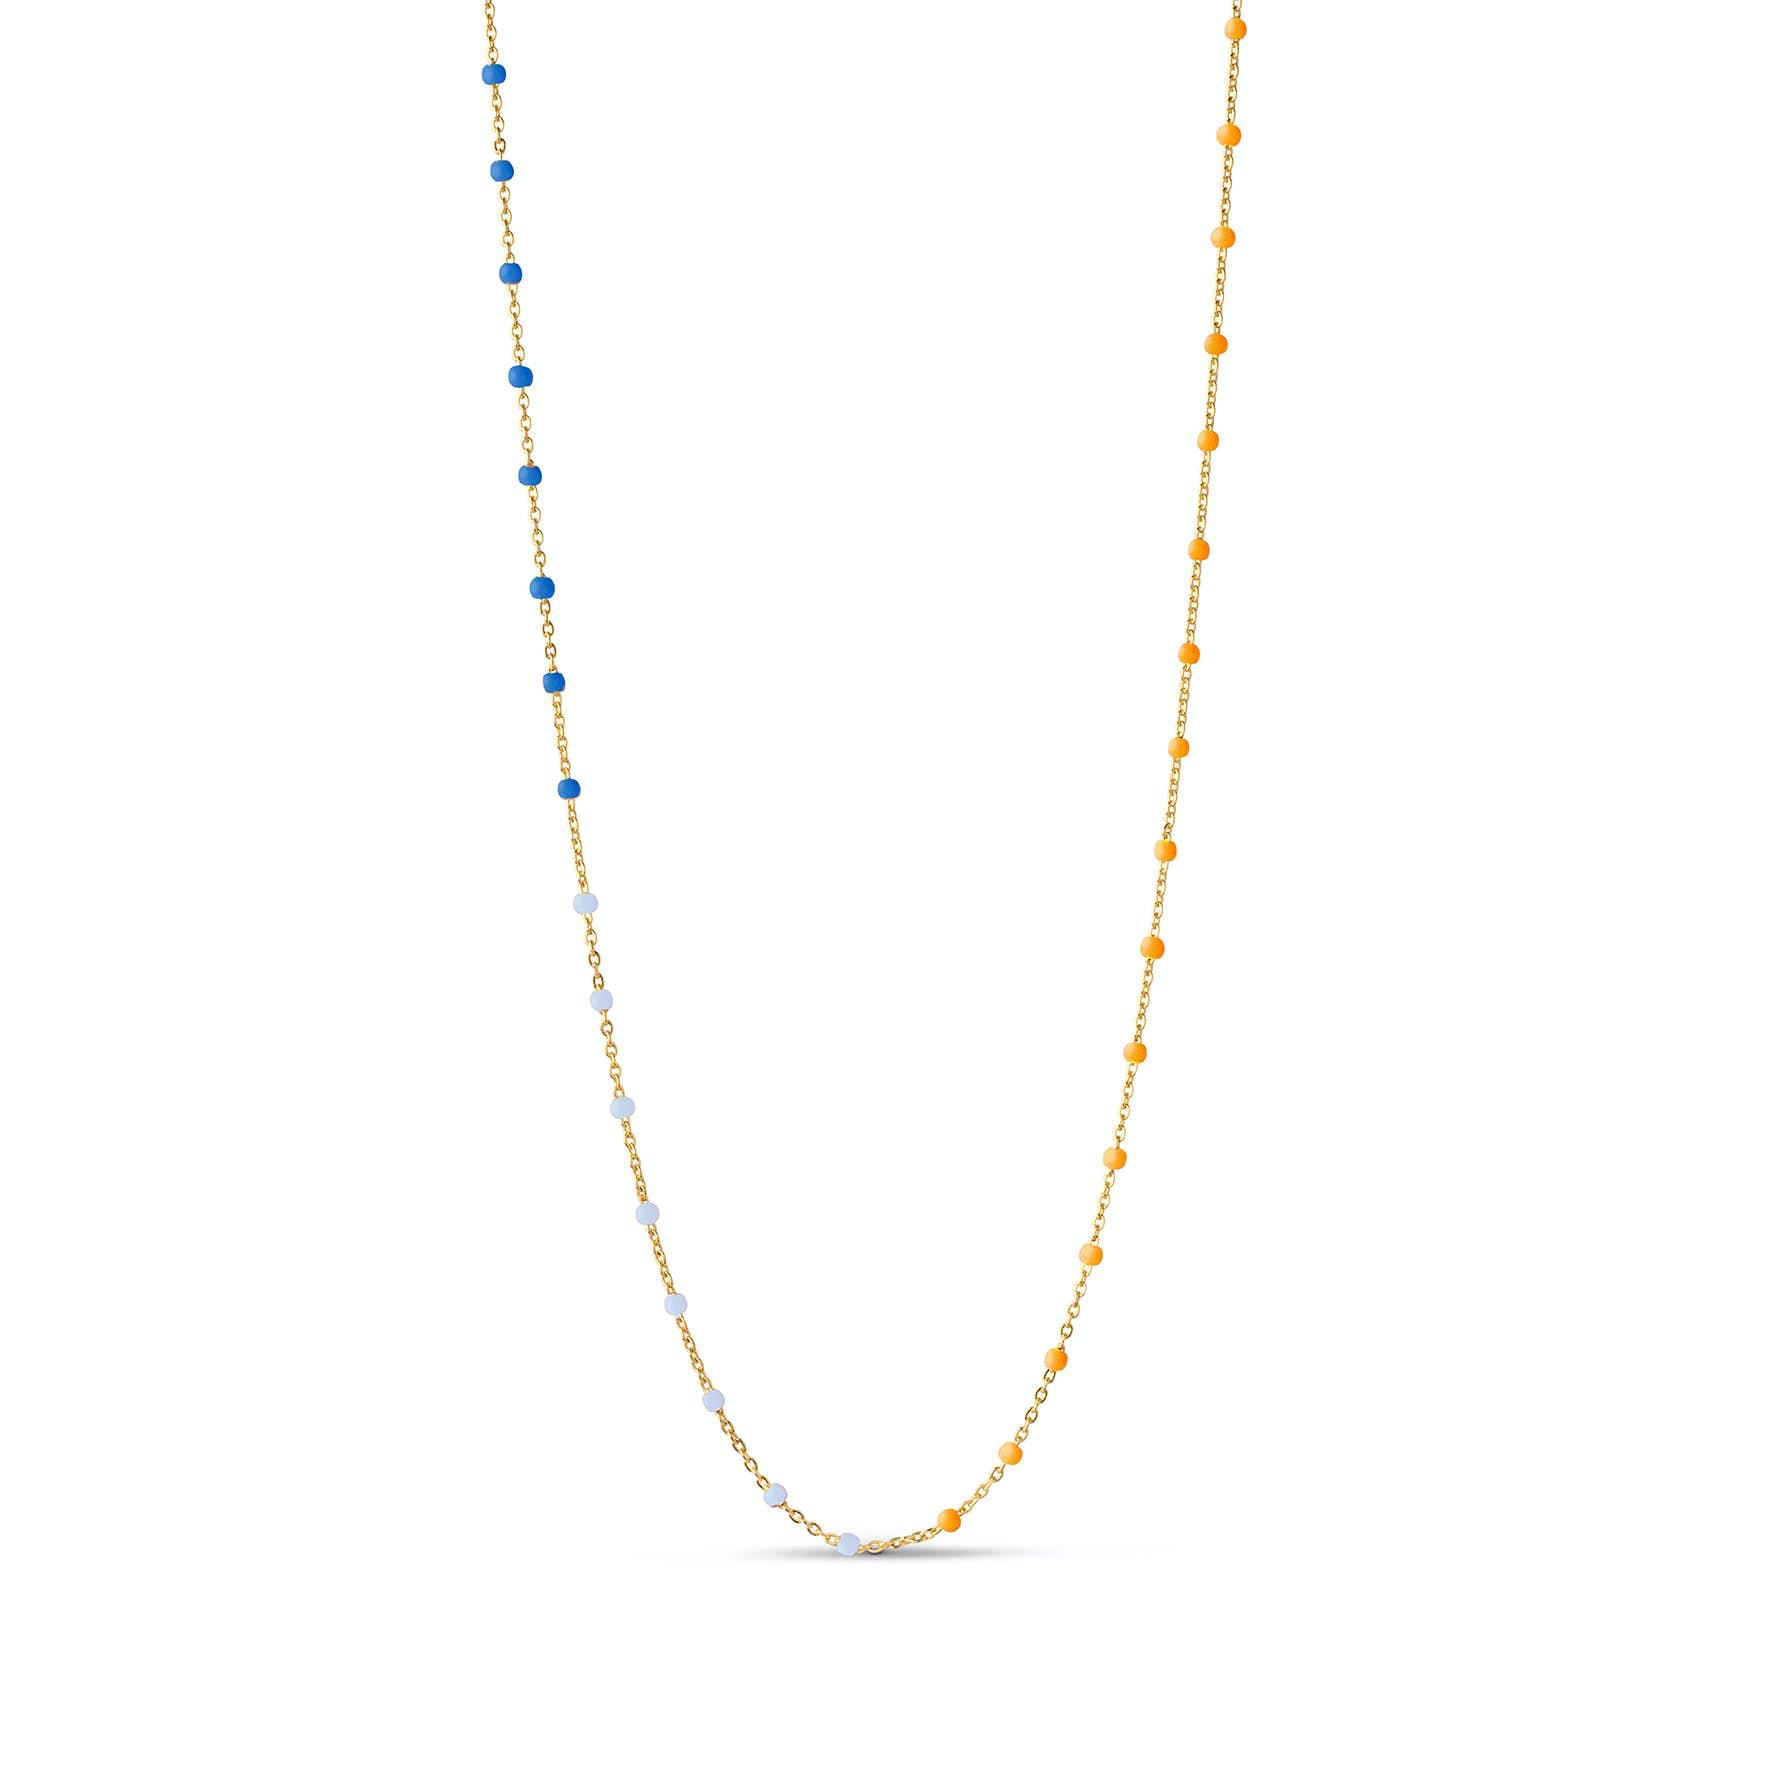 Lola Necklace Breezy von Enamel Copenhagen in Vergoldet-Silber Sterling 925